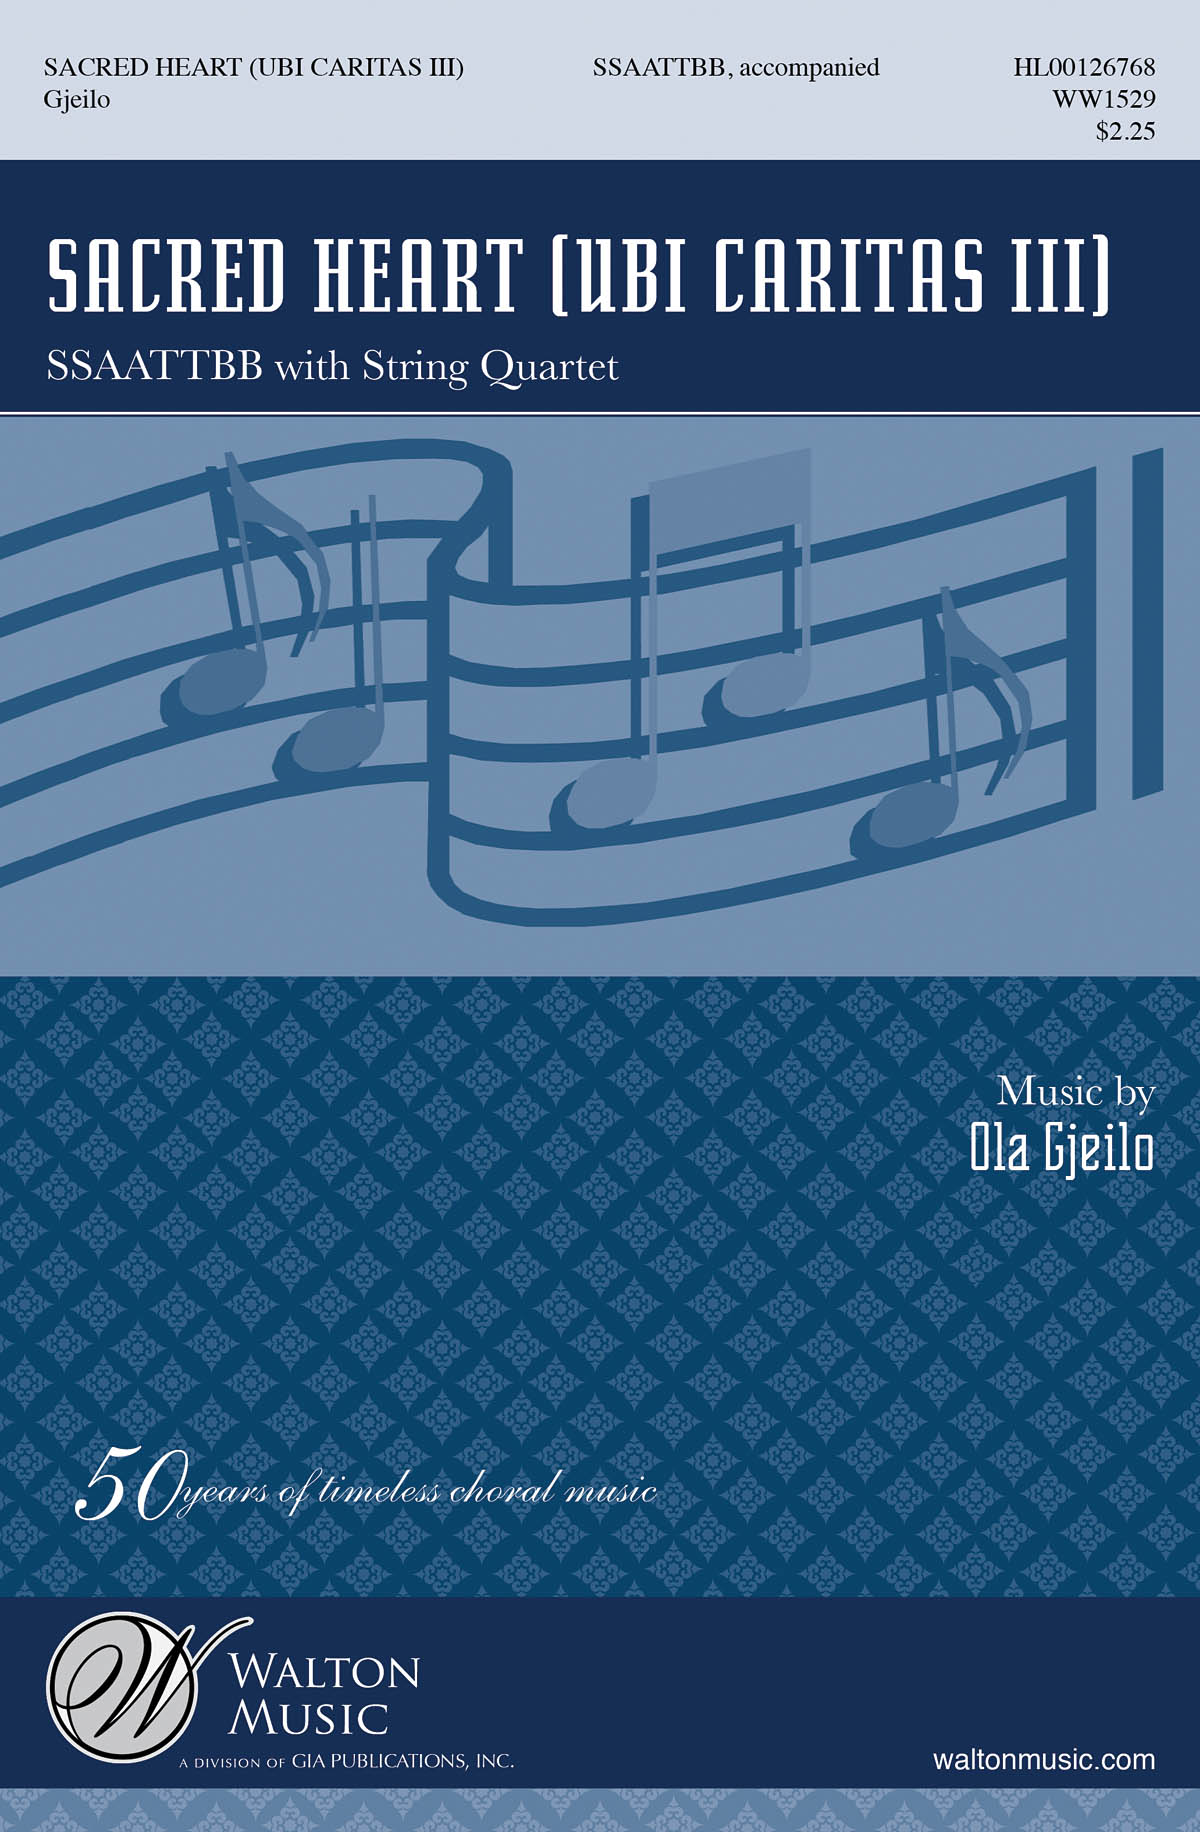 Ola Gjeilo: Ubi Caritas III (Sacred Heart). Sheet Music for SATB  String Quartet